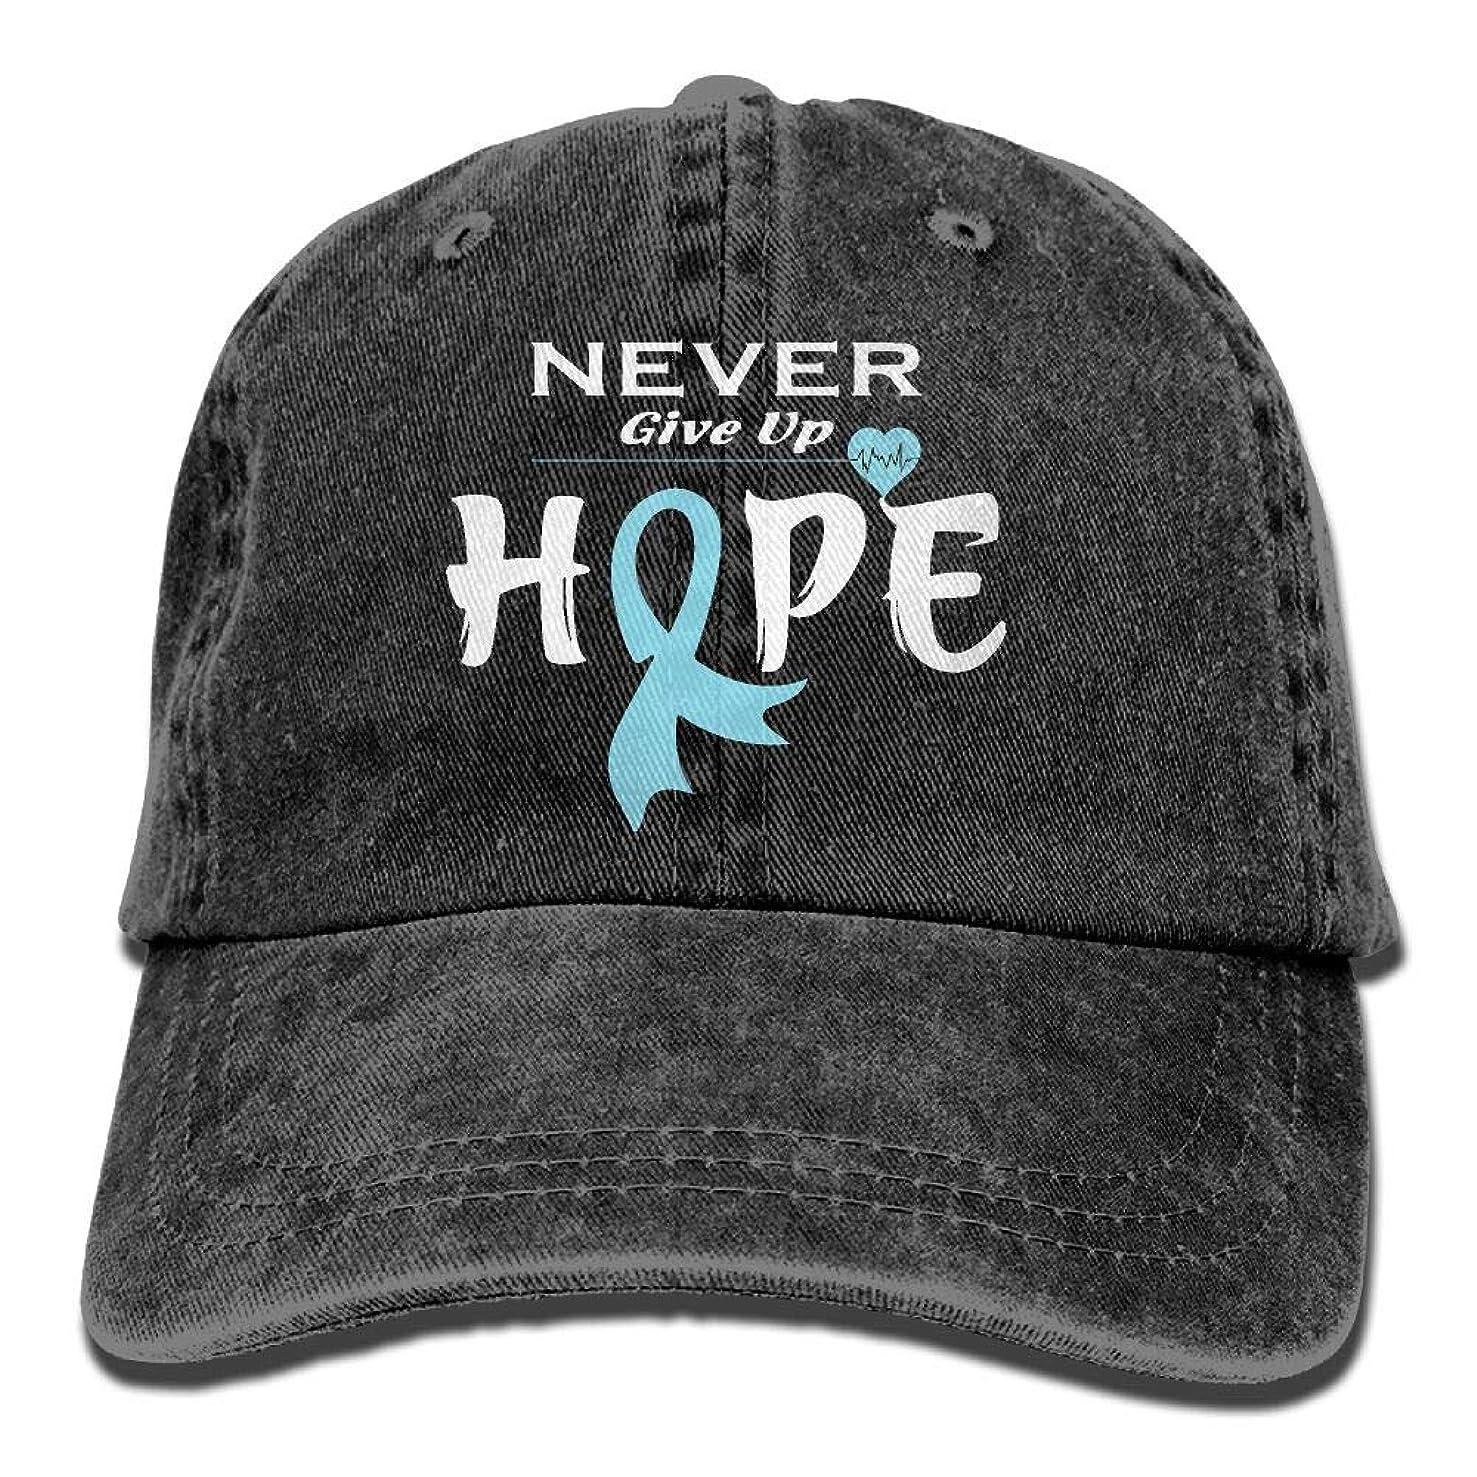 NZWJW85 2018 Adult Fashion Cotton Denim Baseball Cap Prostate Cancer Awareness-1 Classic Dad Hat Adjustable Plain Cap